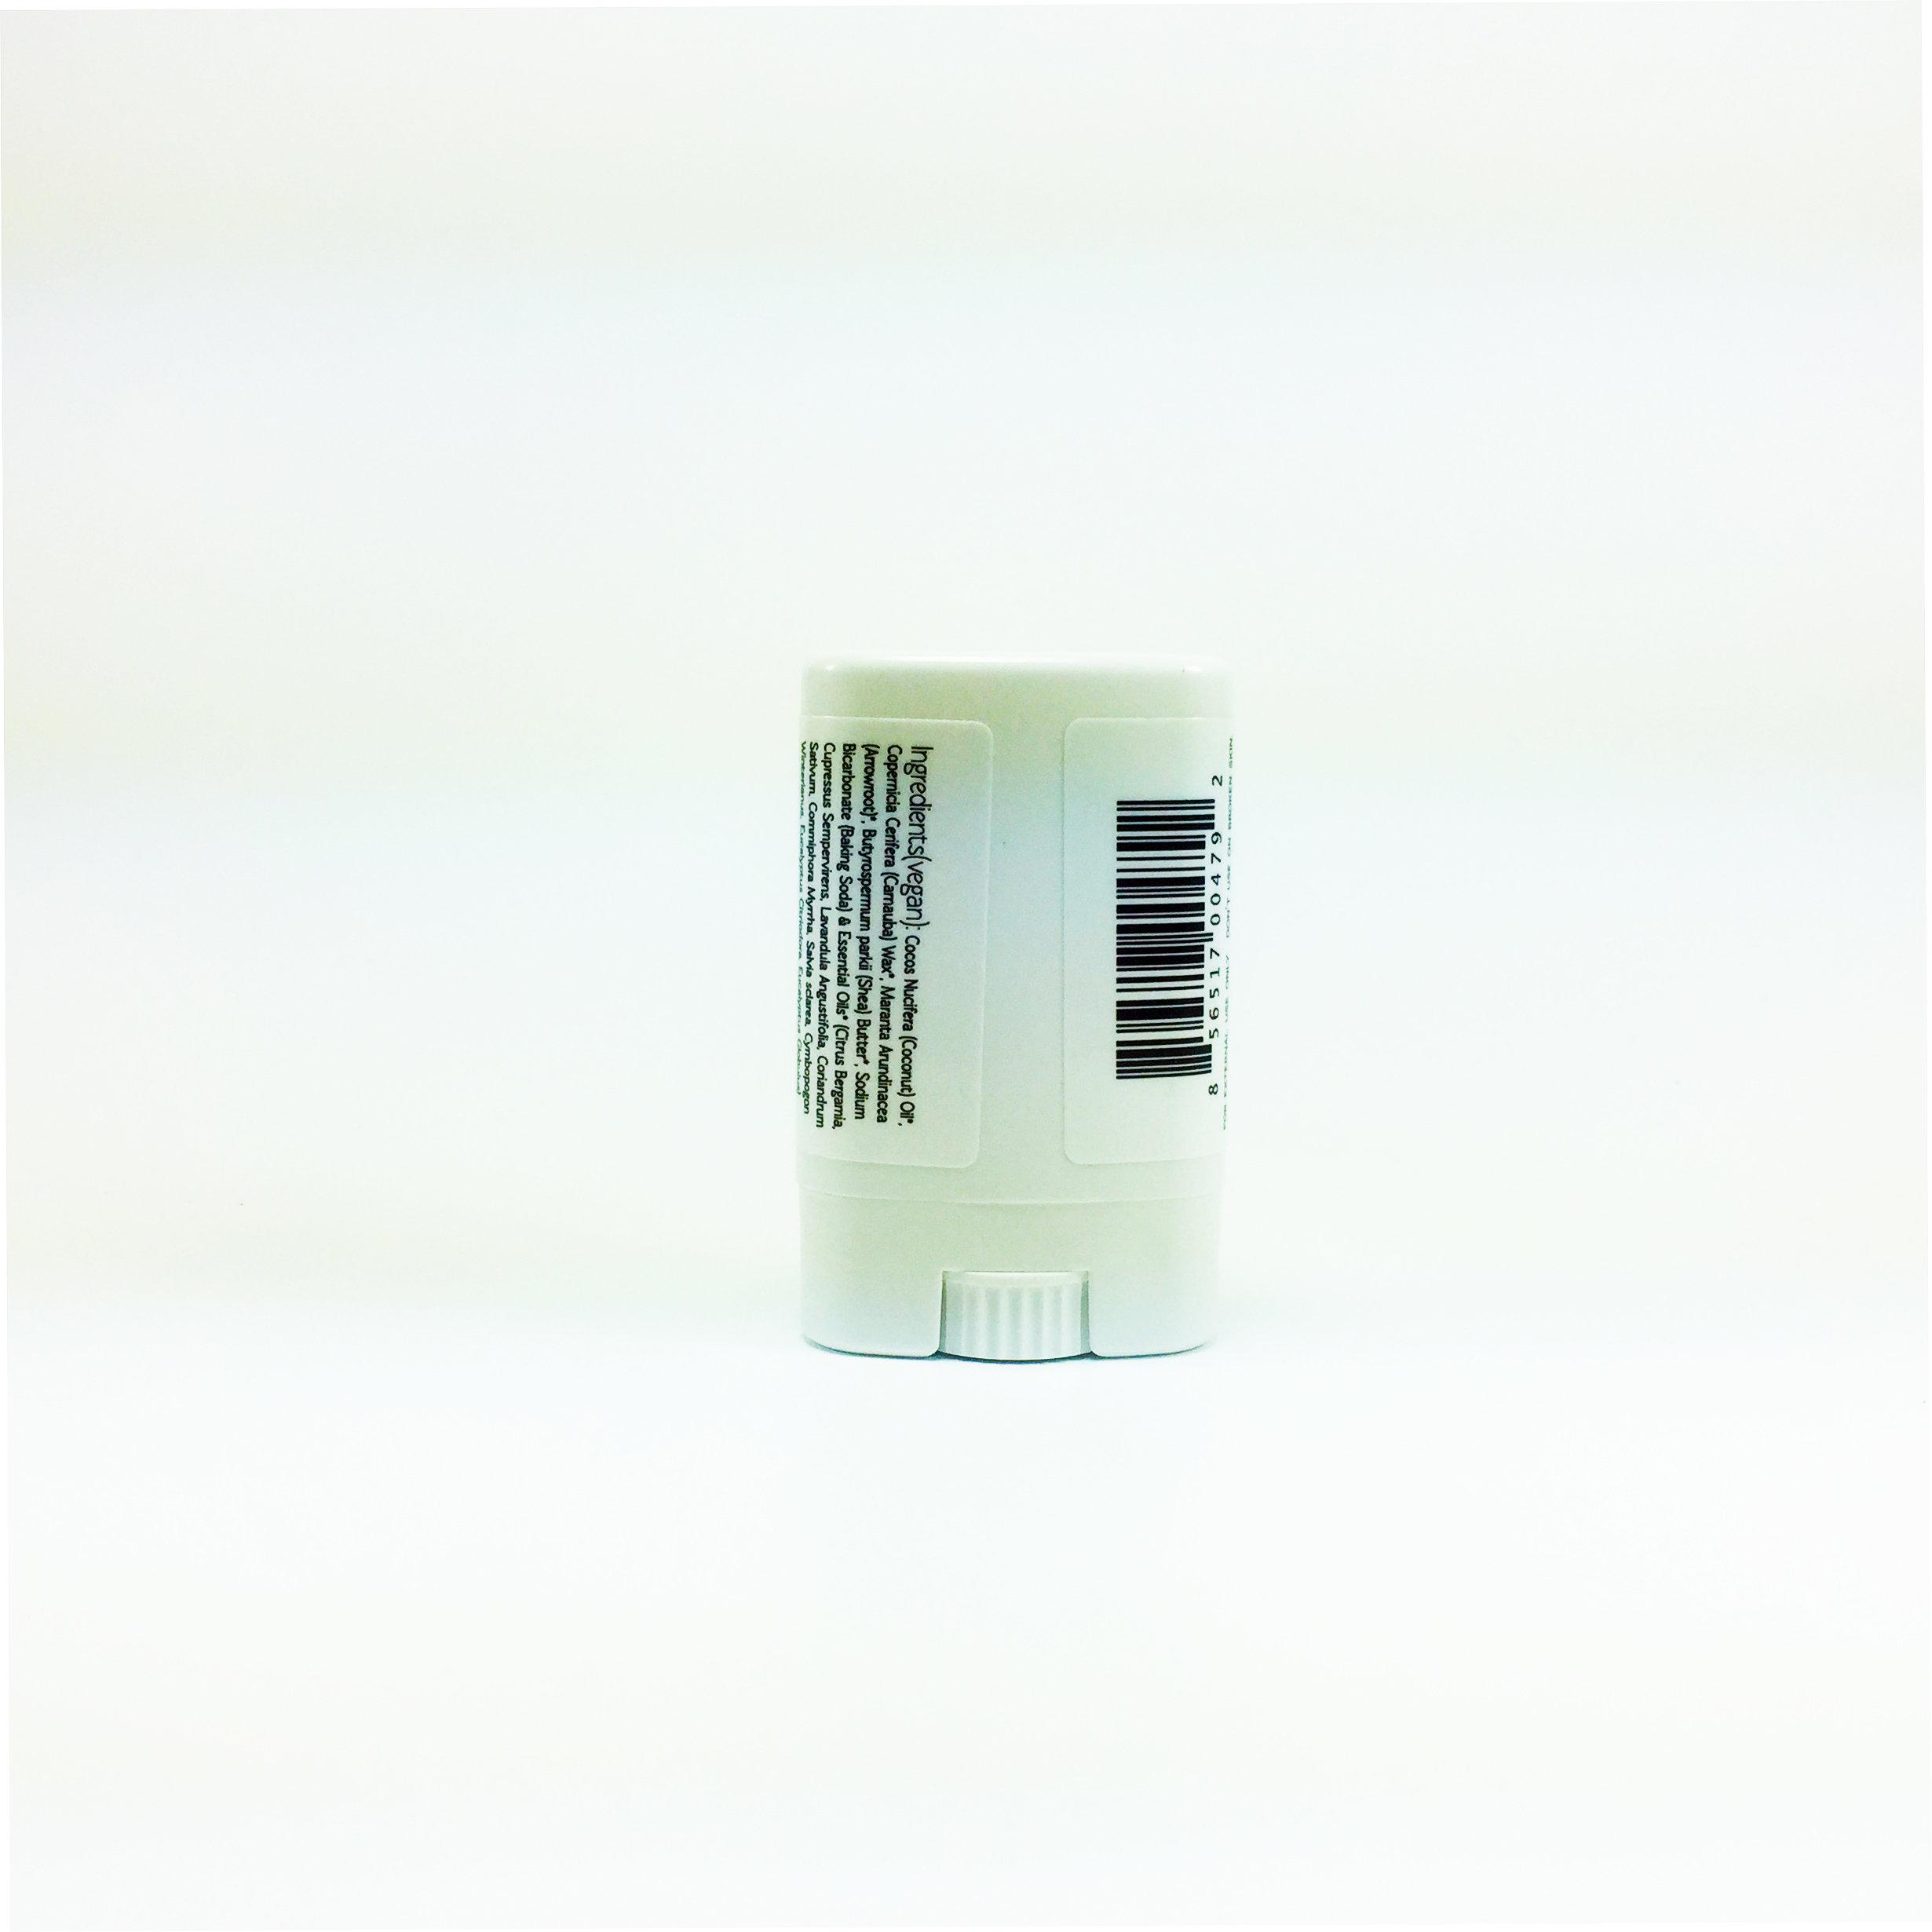 Al Sol Organic Deodorant Back Label